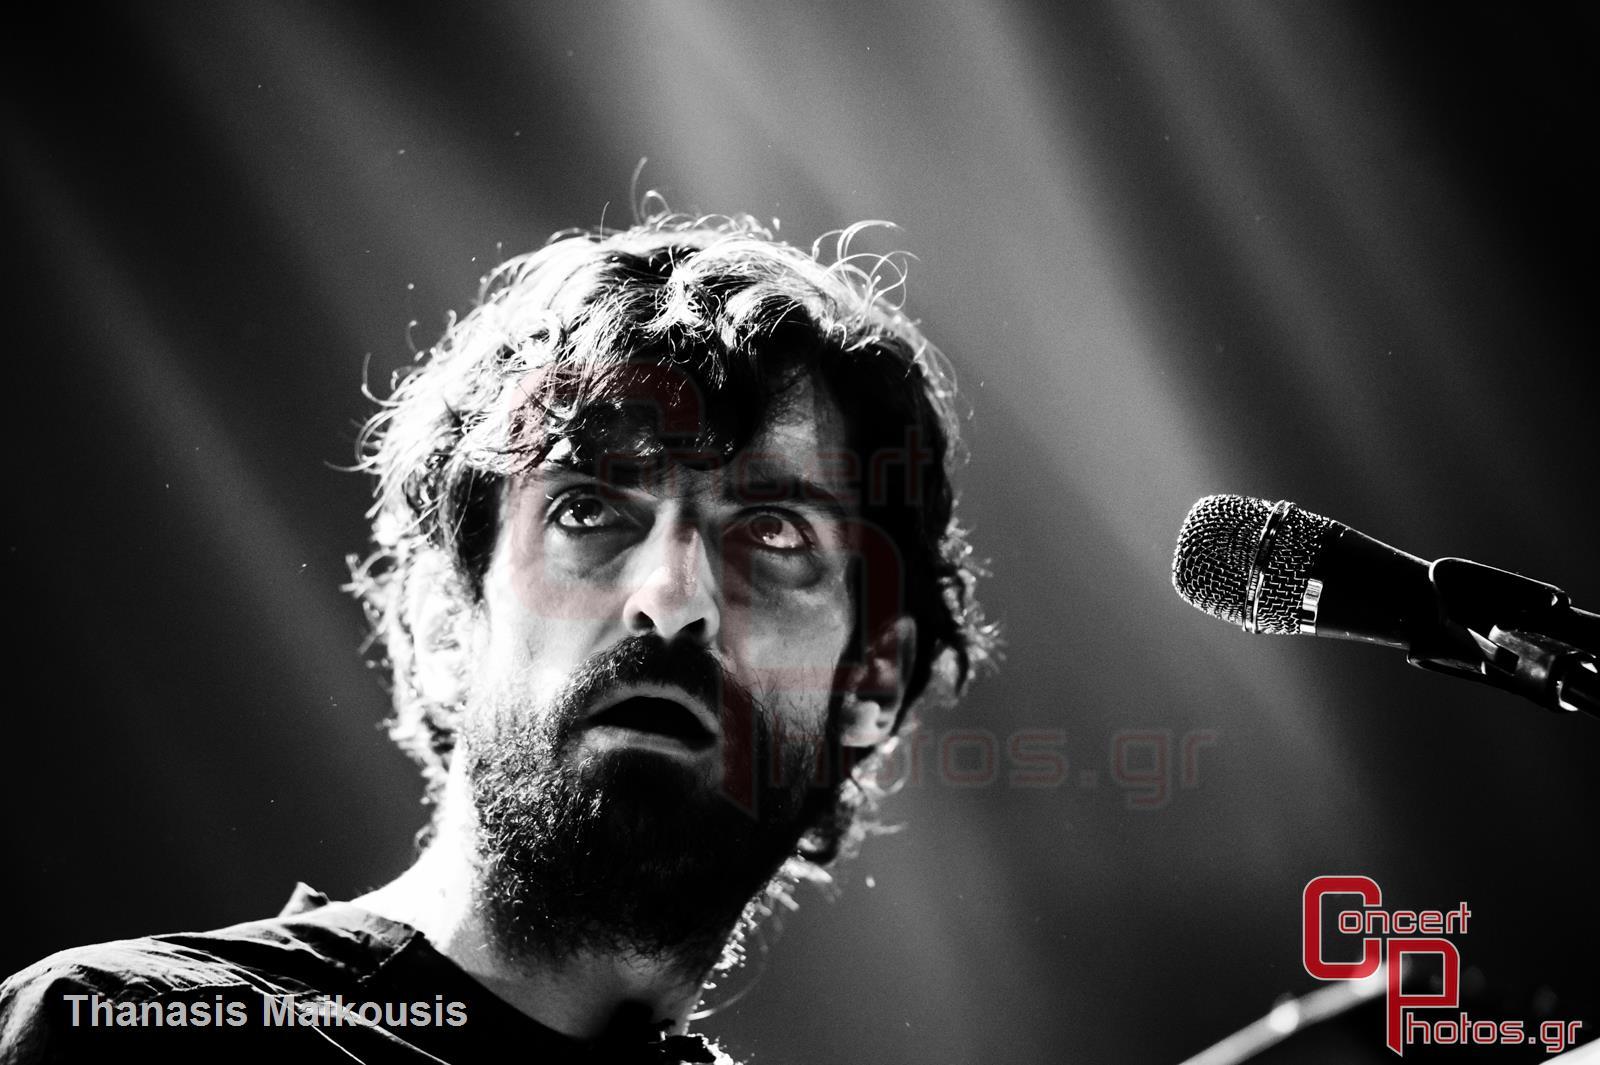 Gramatik-Gramatik Votanikos 2013 photographer: Thanasis Maikousis - ConcertPhotos-5142